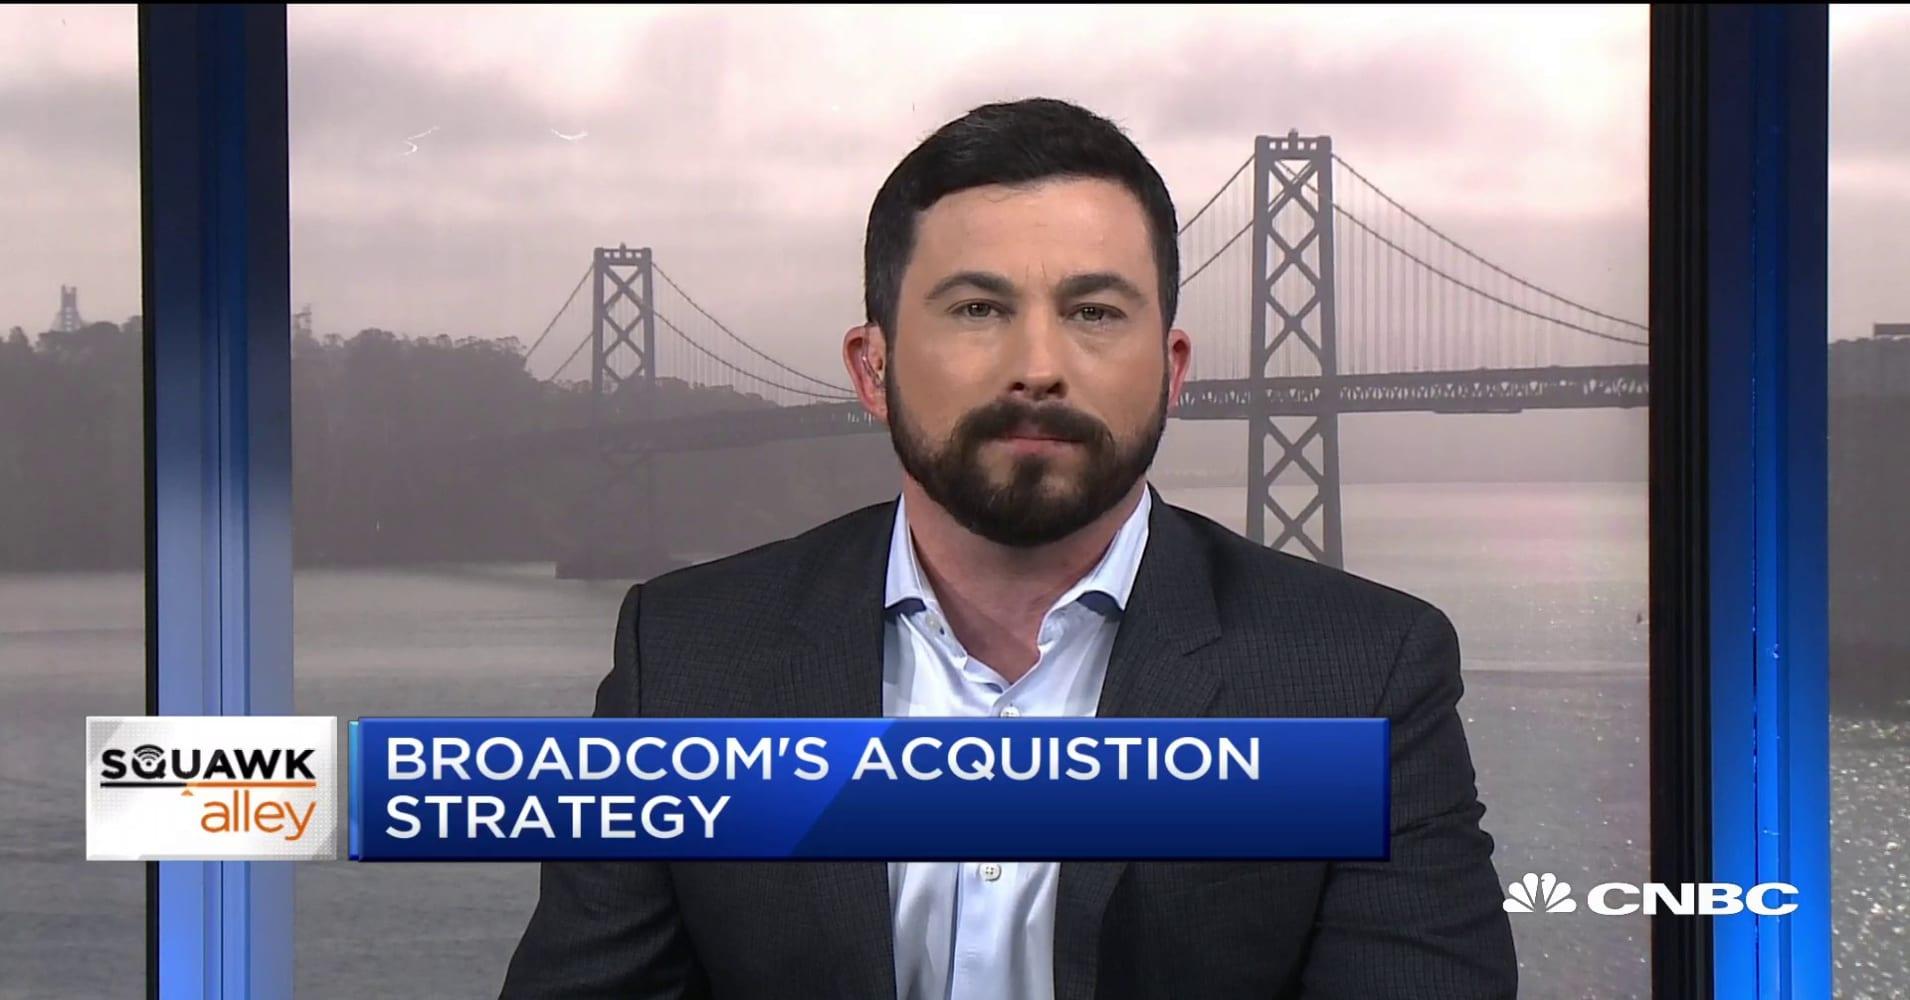 Broadcom's acquisition strategy with Symantec